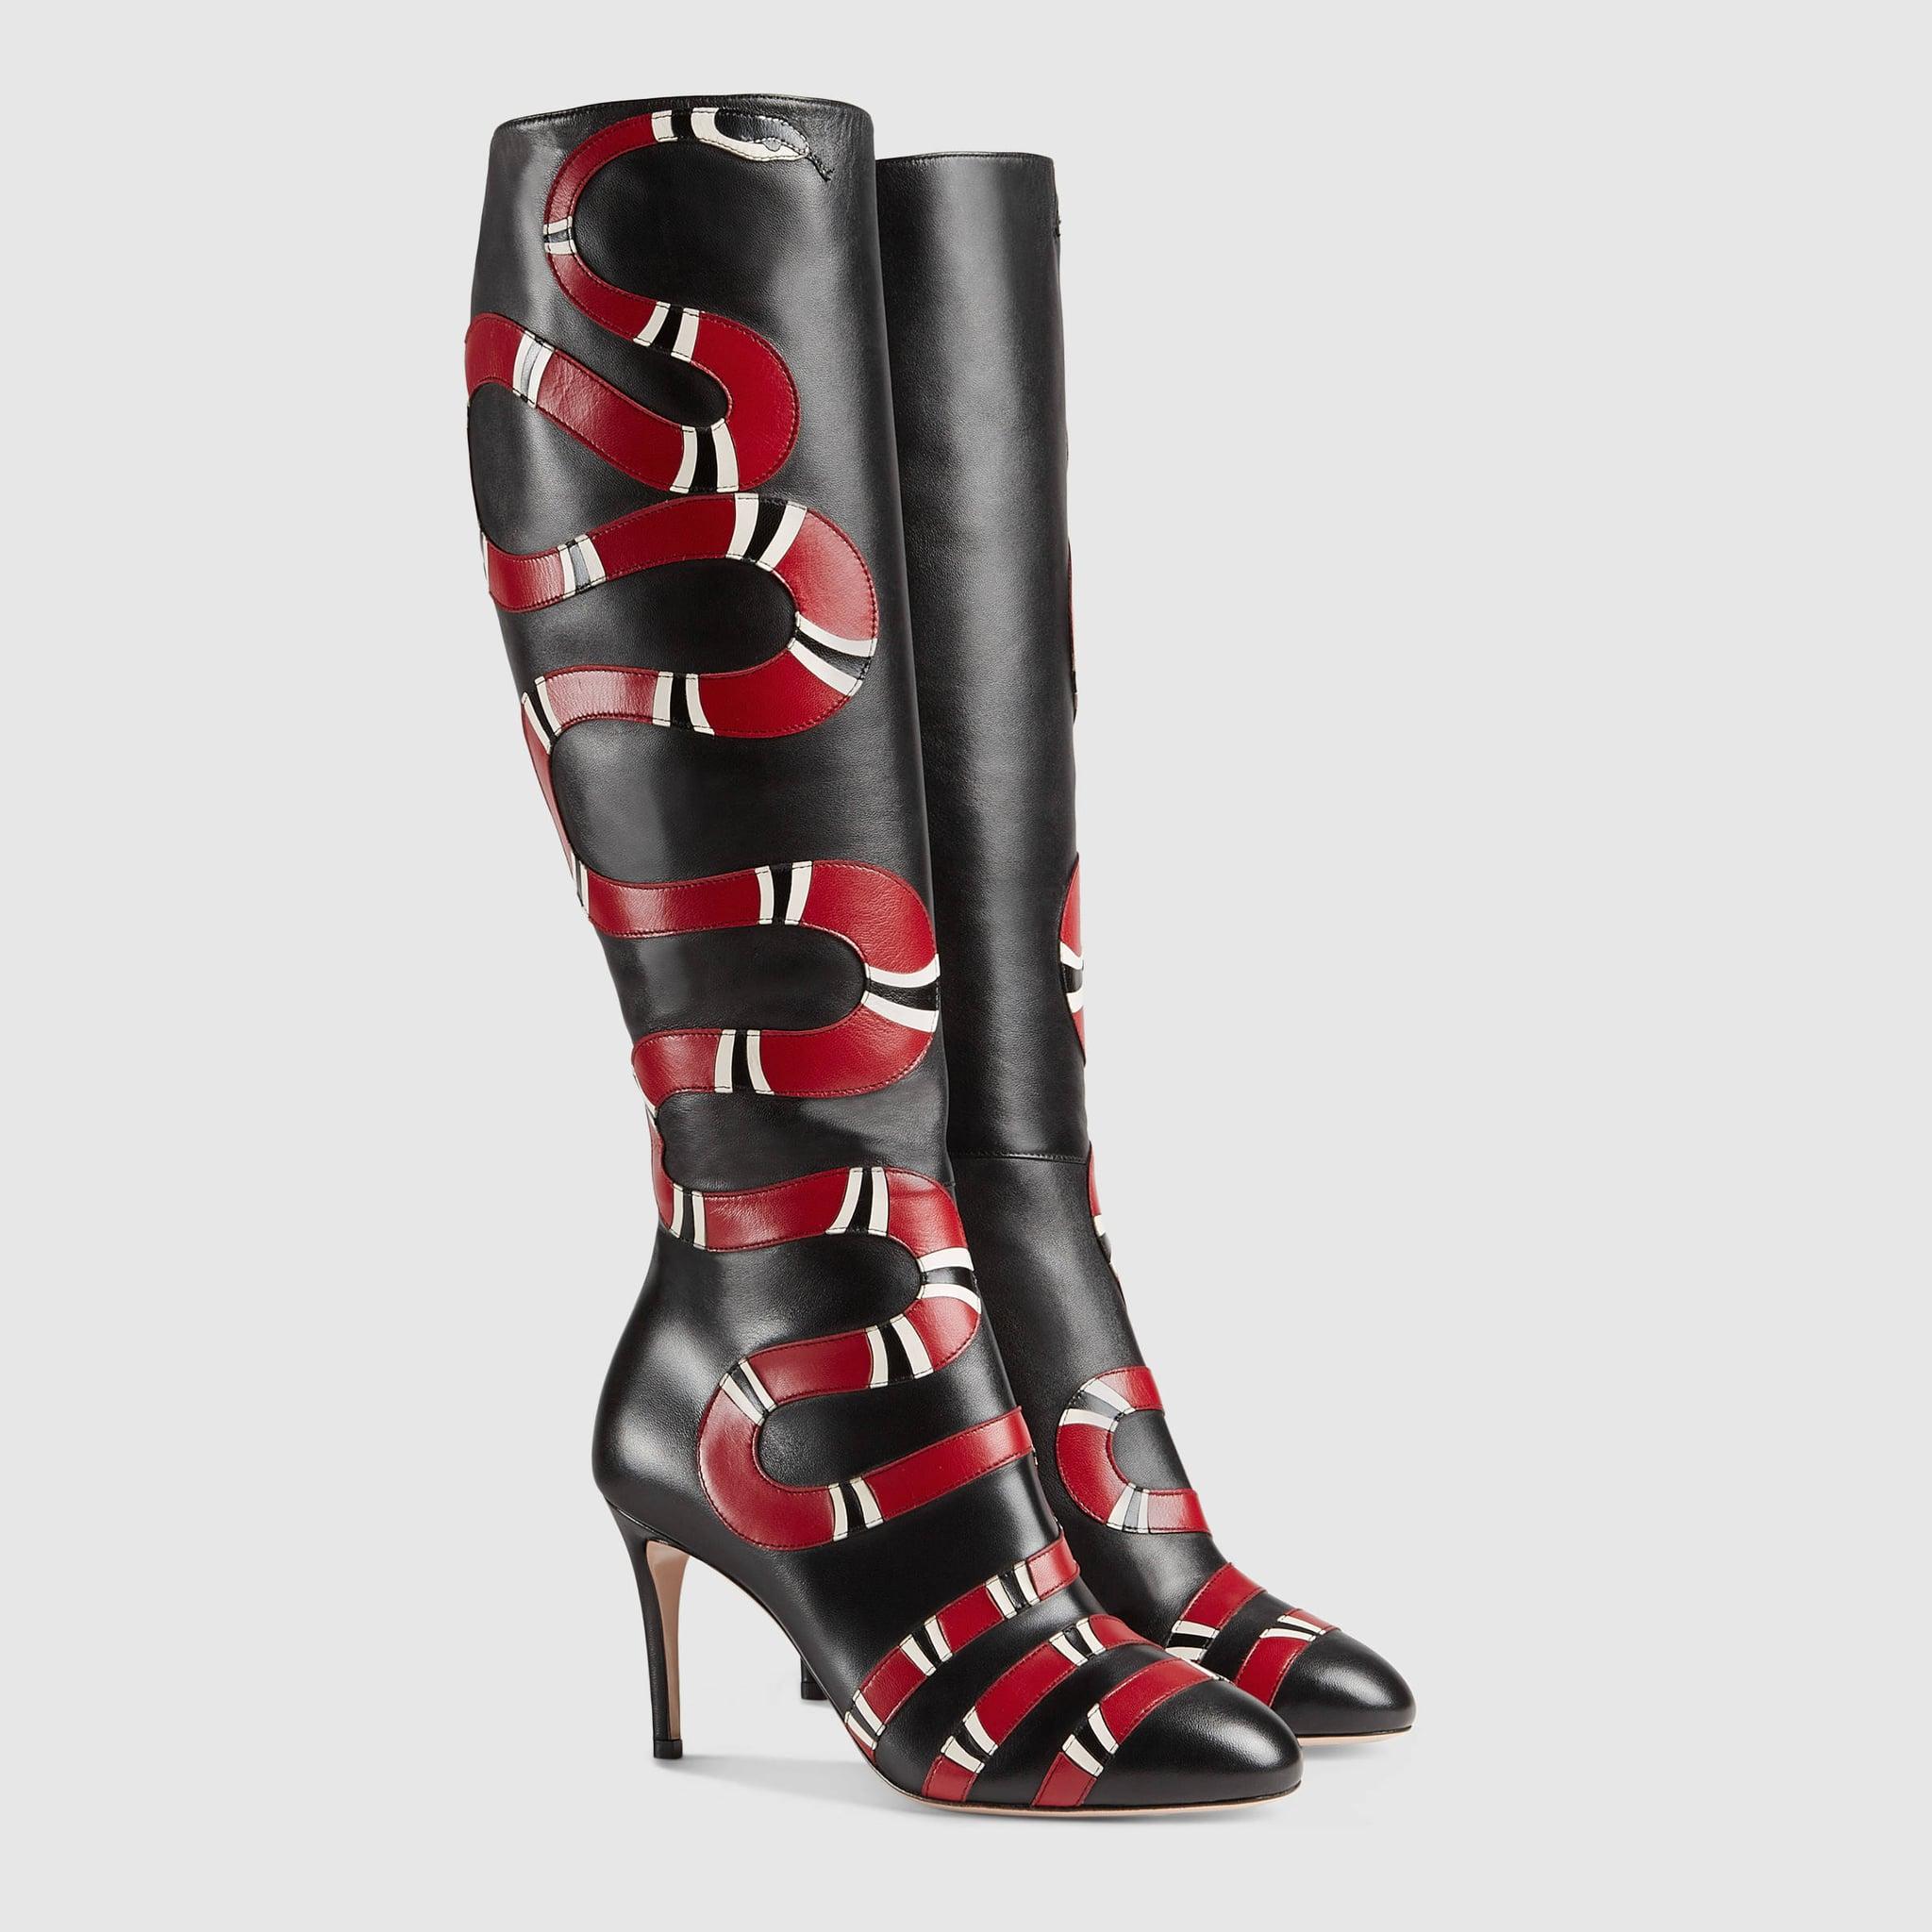 3942b28b6311f Taylor s Exact Gucci Boots